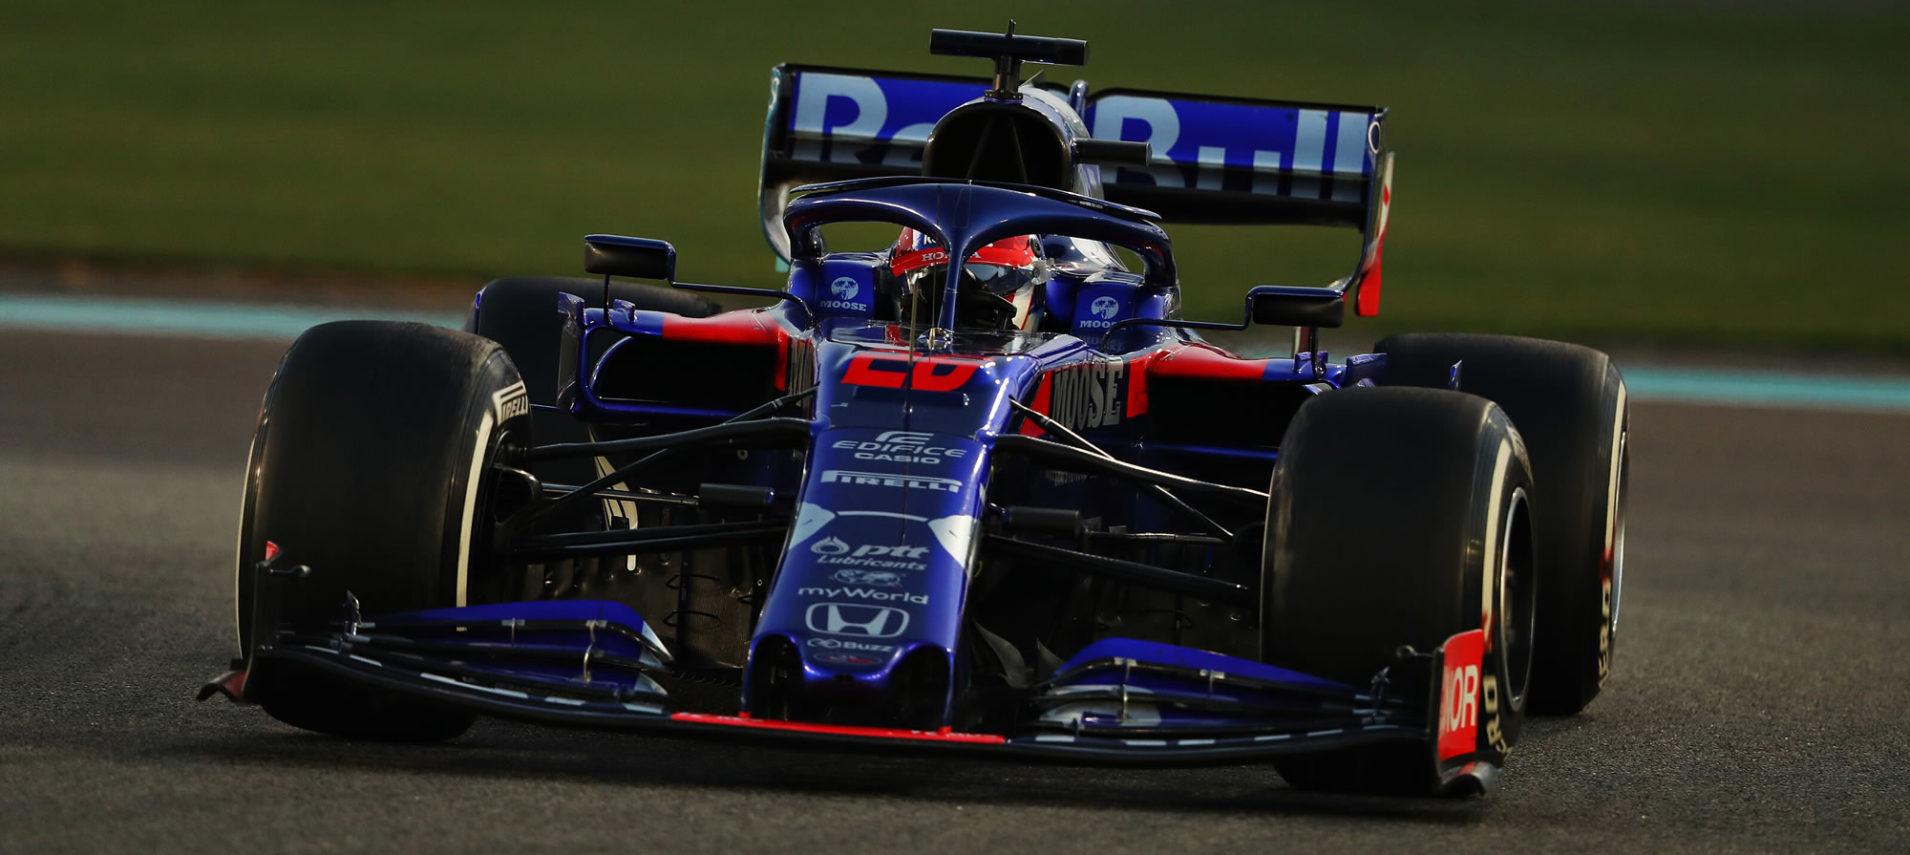 2019 Abu Dhabi GP – Gallery 3